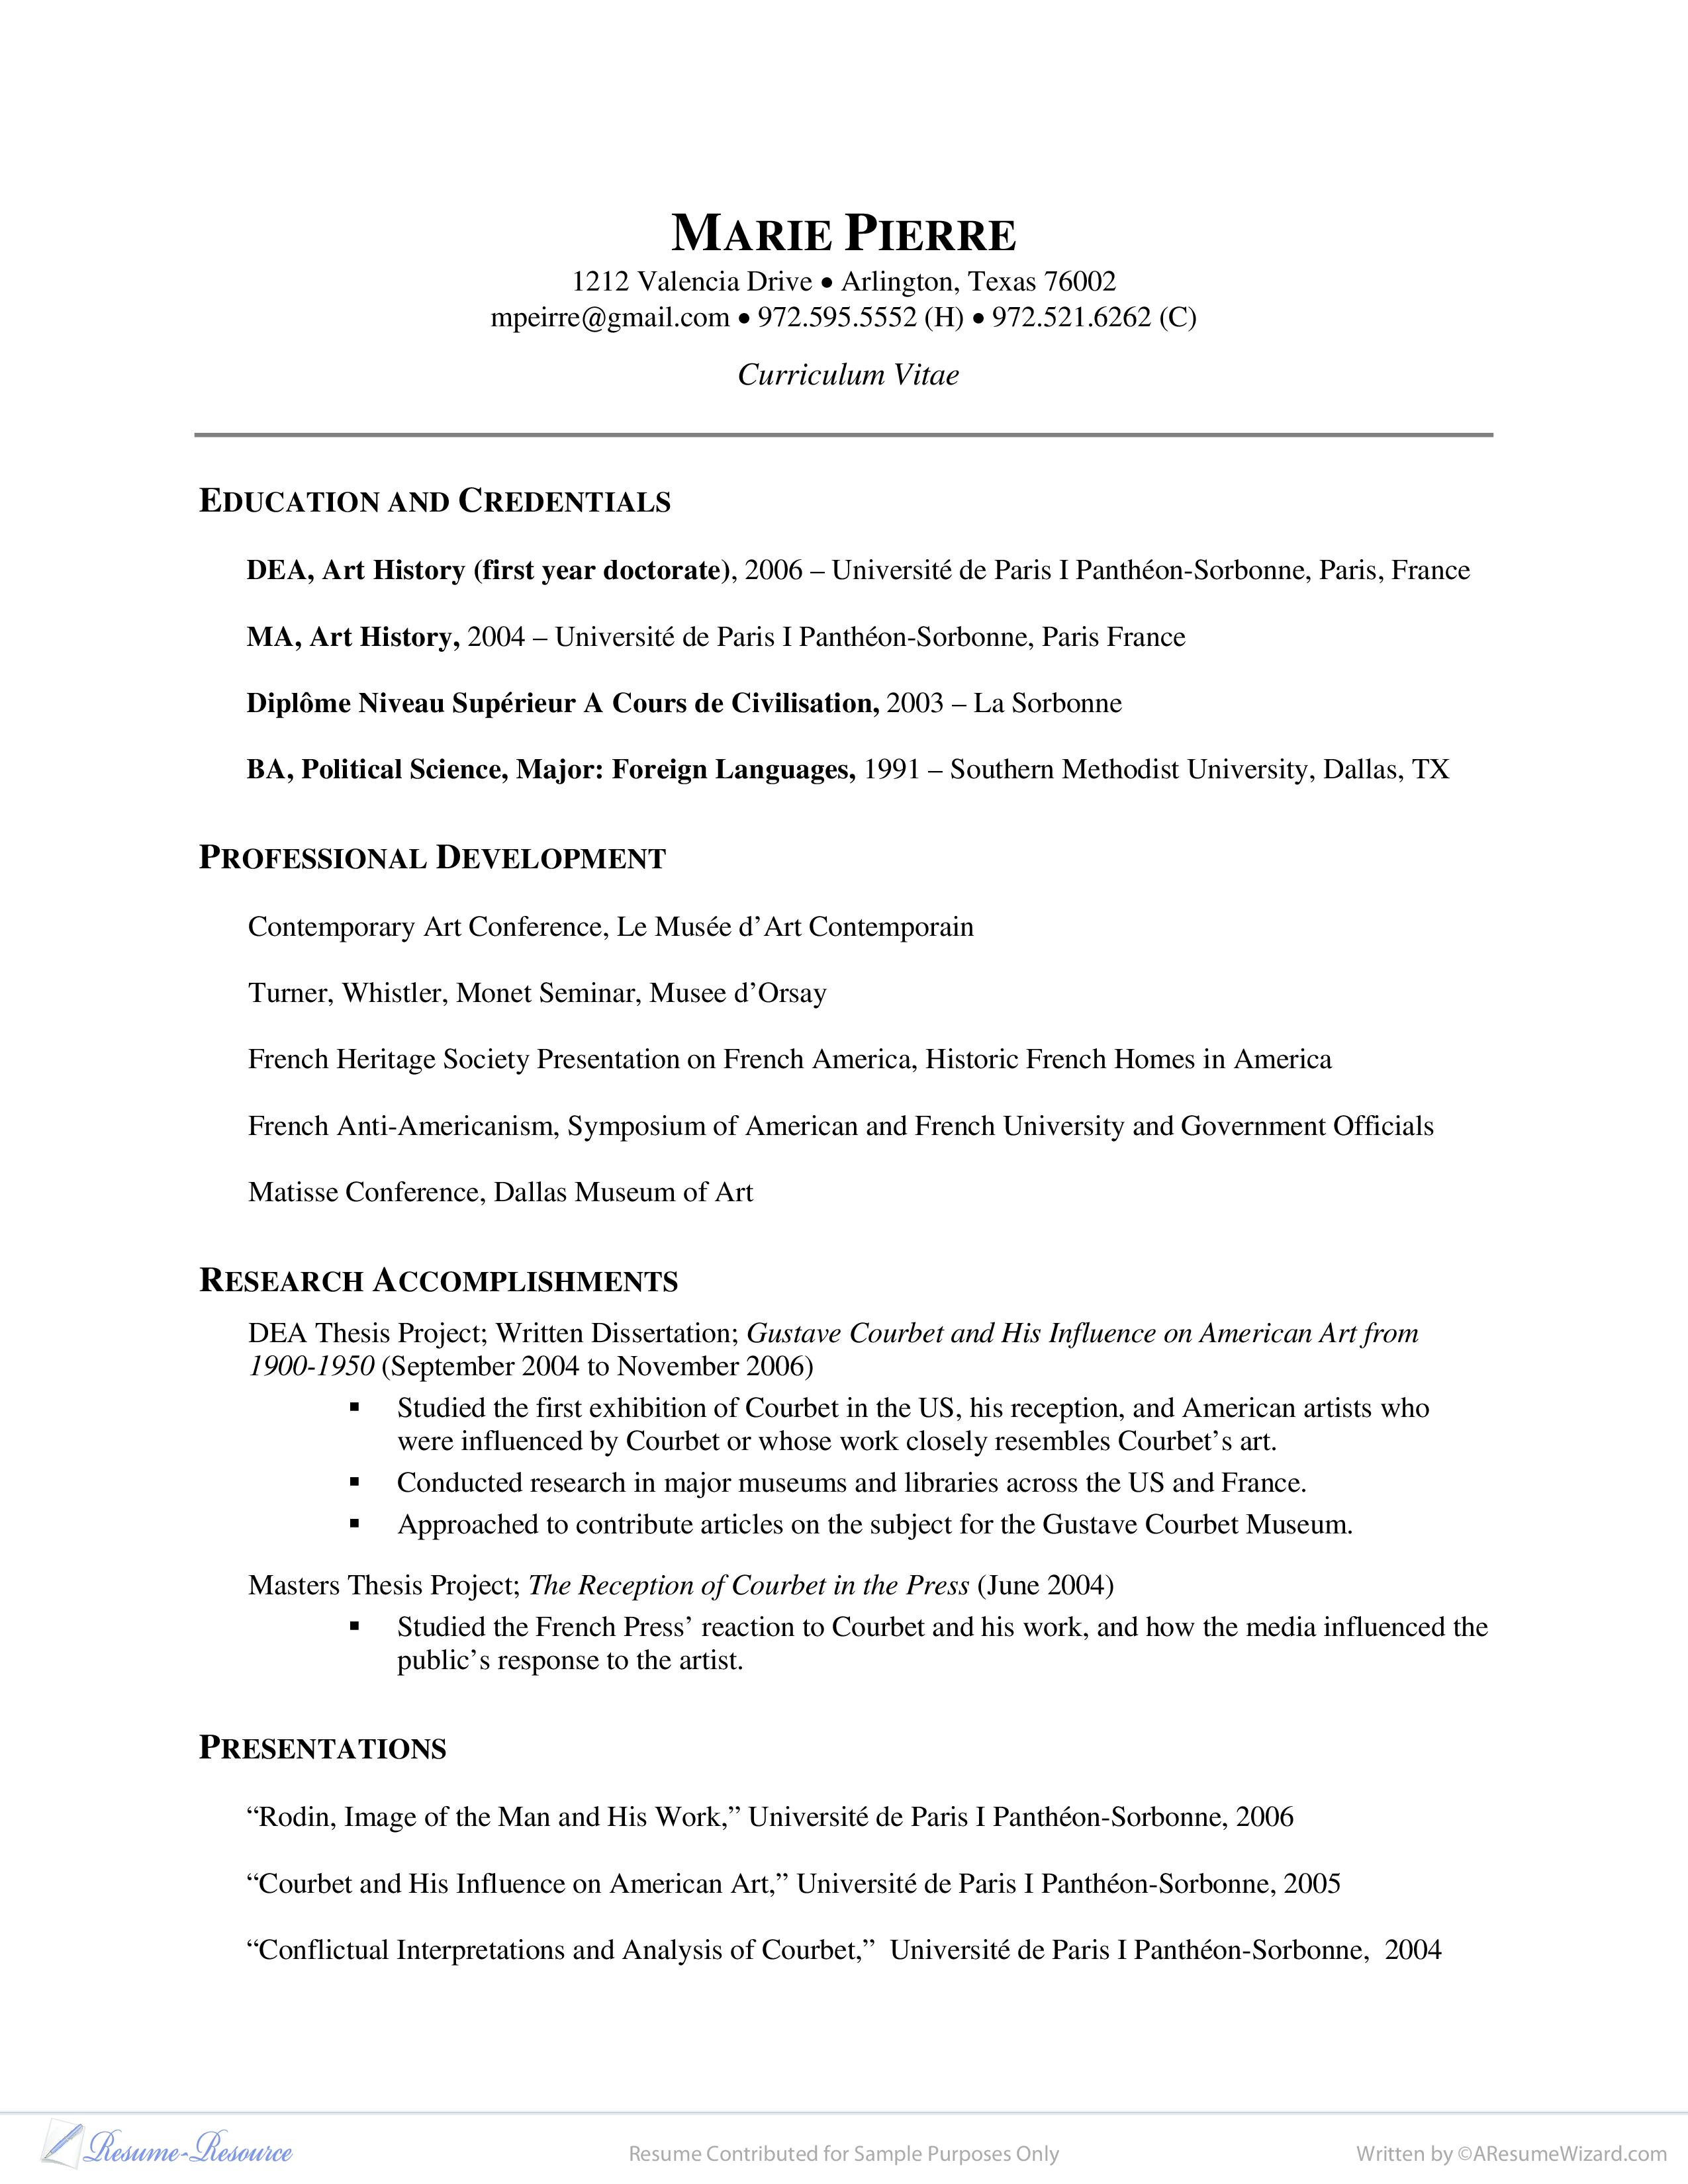 Curriculum Vitae Example Researcher Art History Education Cv Example Curriculum Vitae Examples Resume Examples Cv Resume Sample